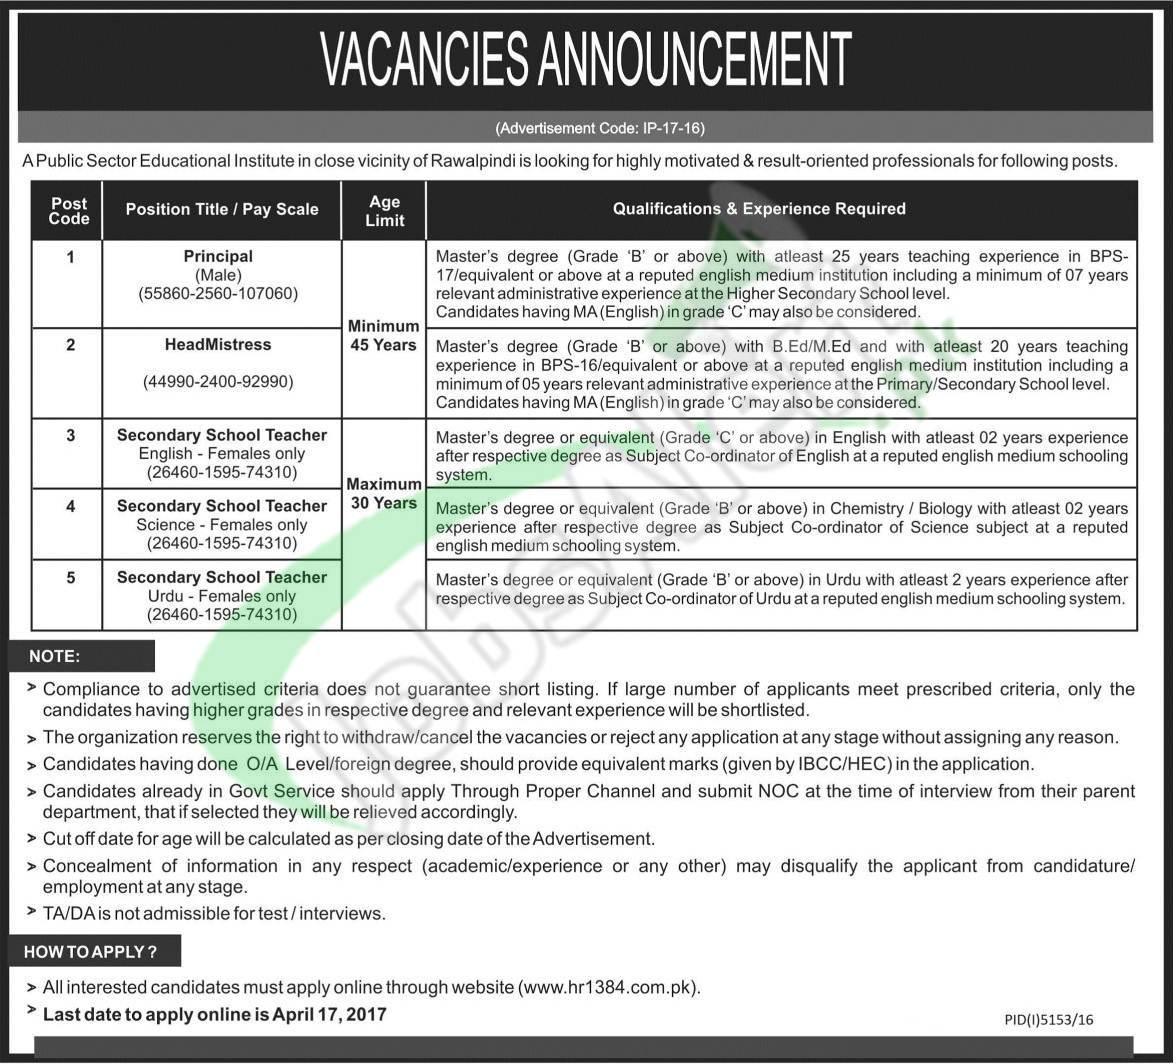 HR1384 Jobs